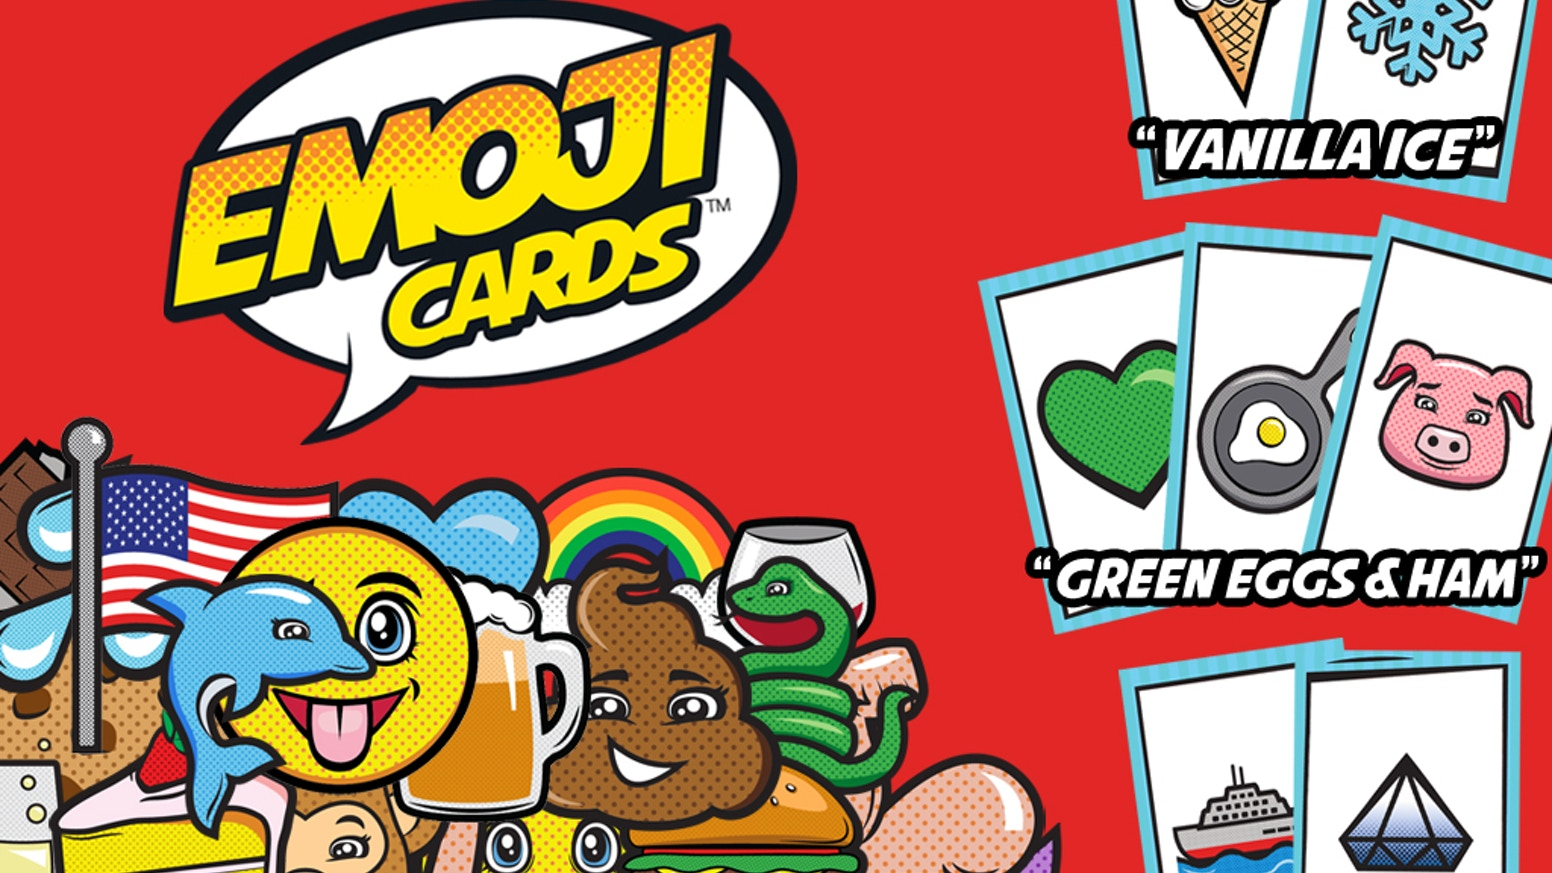 Emoji Cards - Give Pop Culture Clues Using Emoji! by Spicy